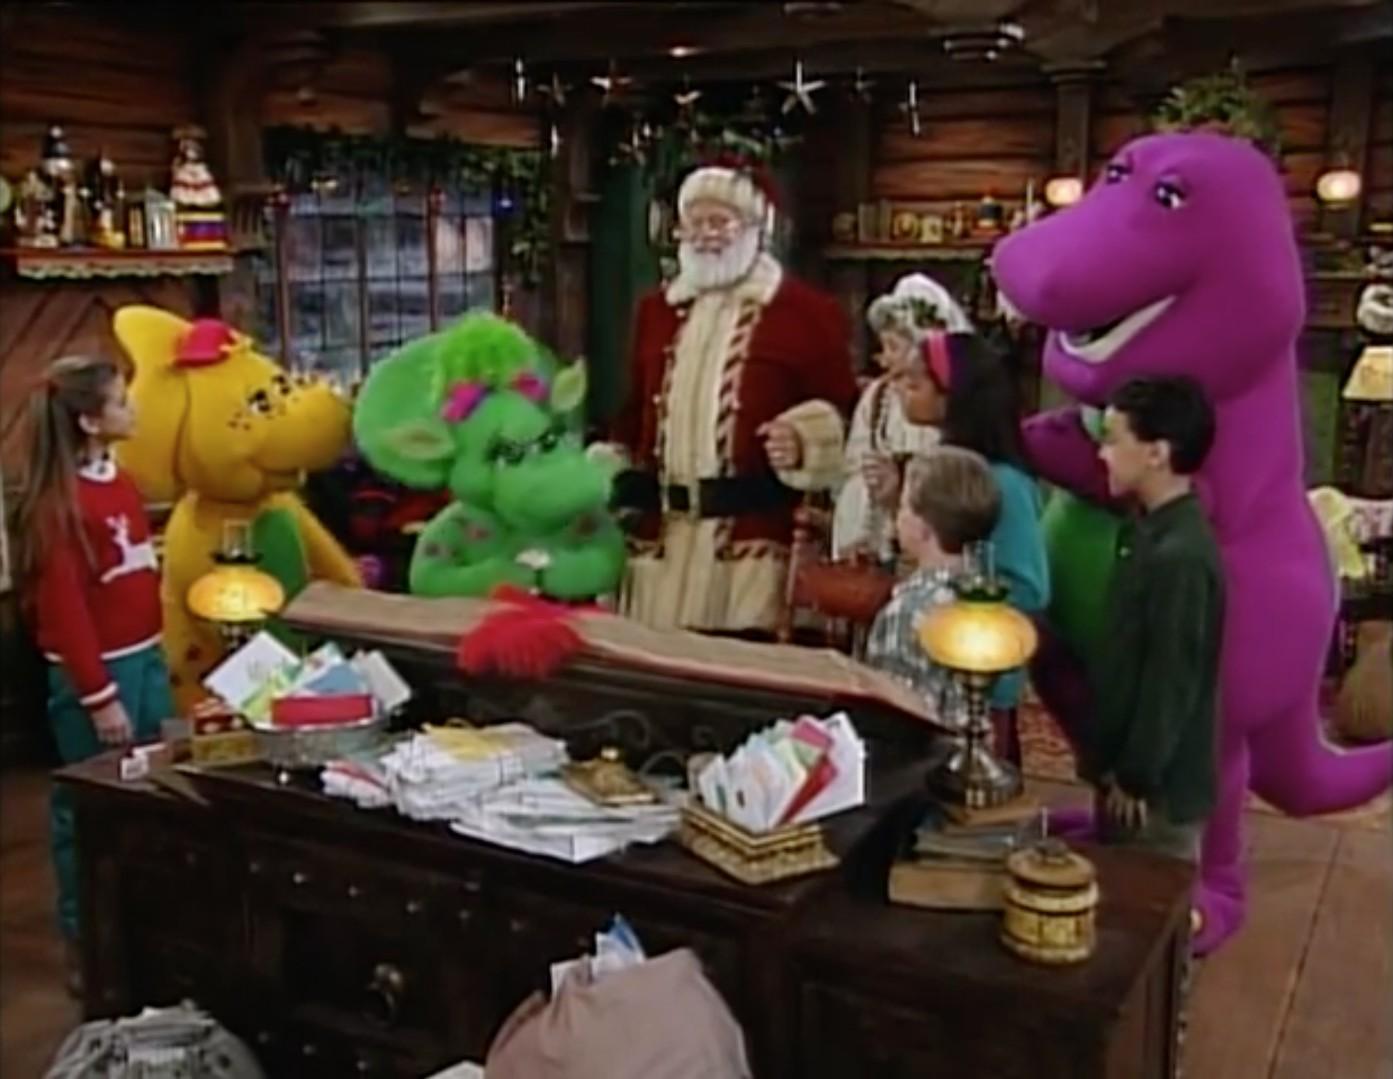 barneys night before christmas - Journey To The Christmas Star Cast